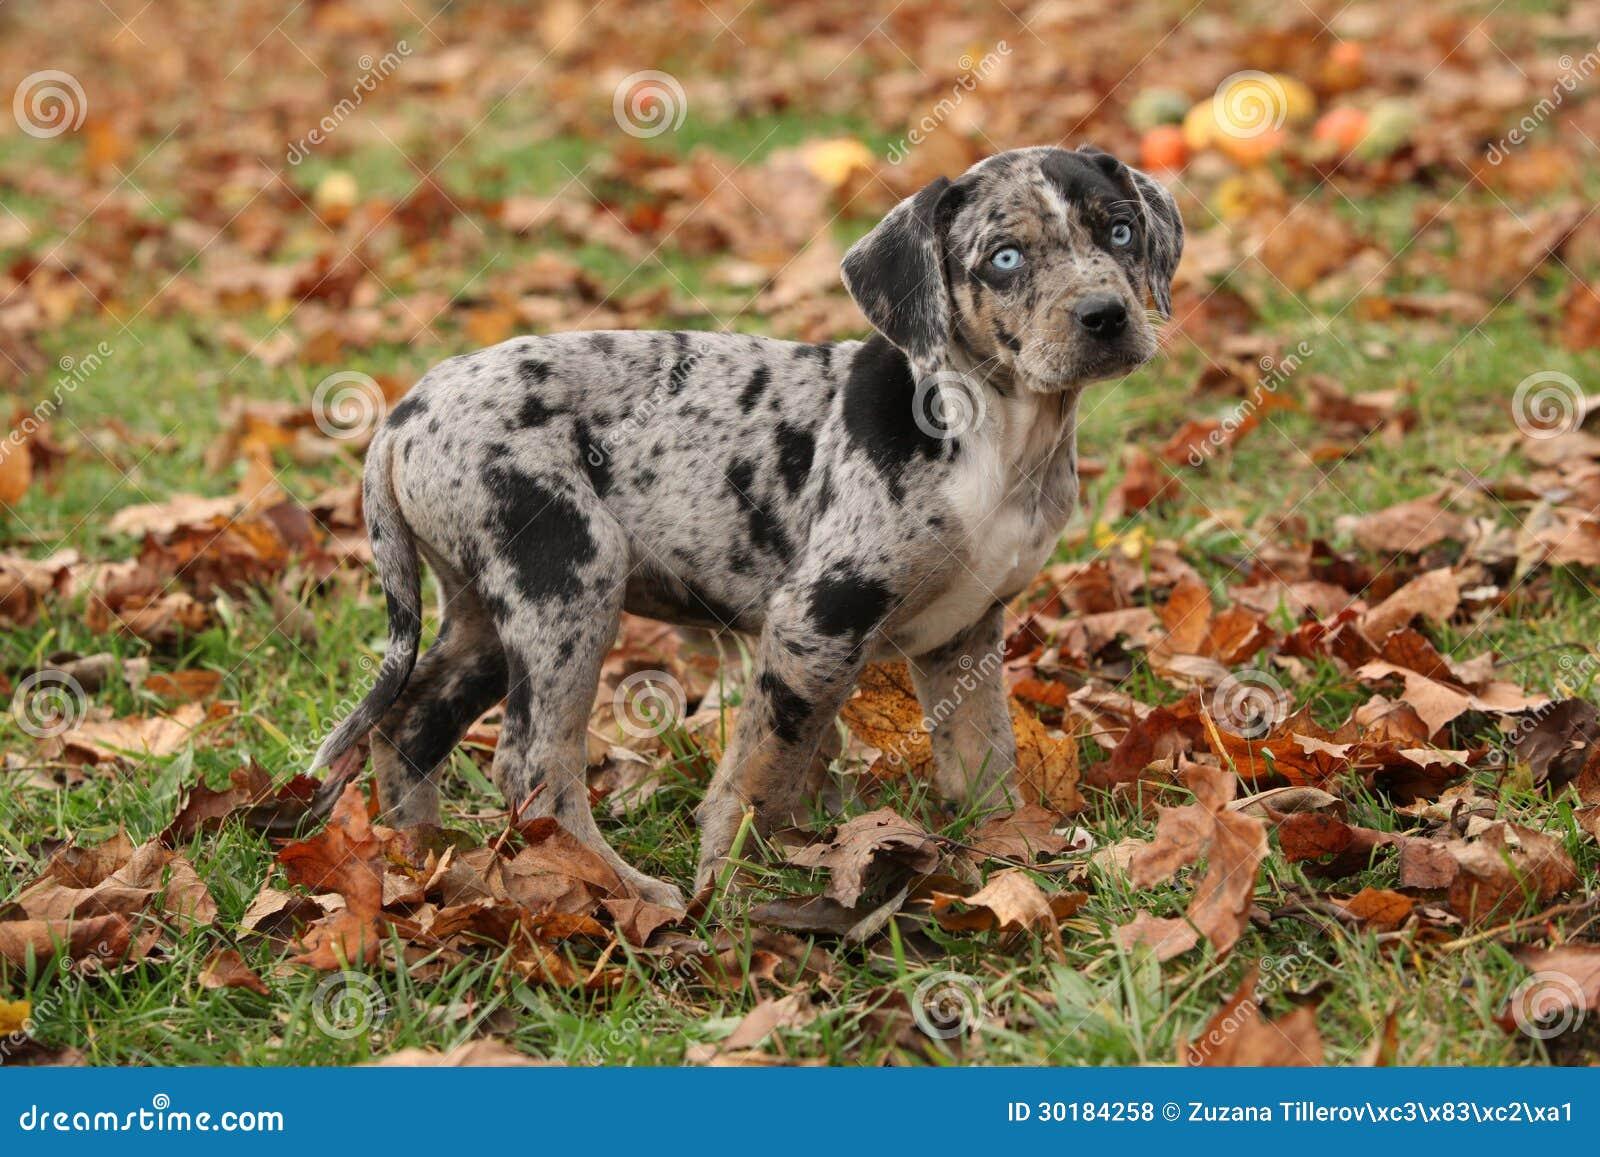 Louisiana Catahoula Puppy In Autumn Stock Photo - Image of